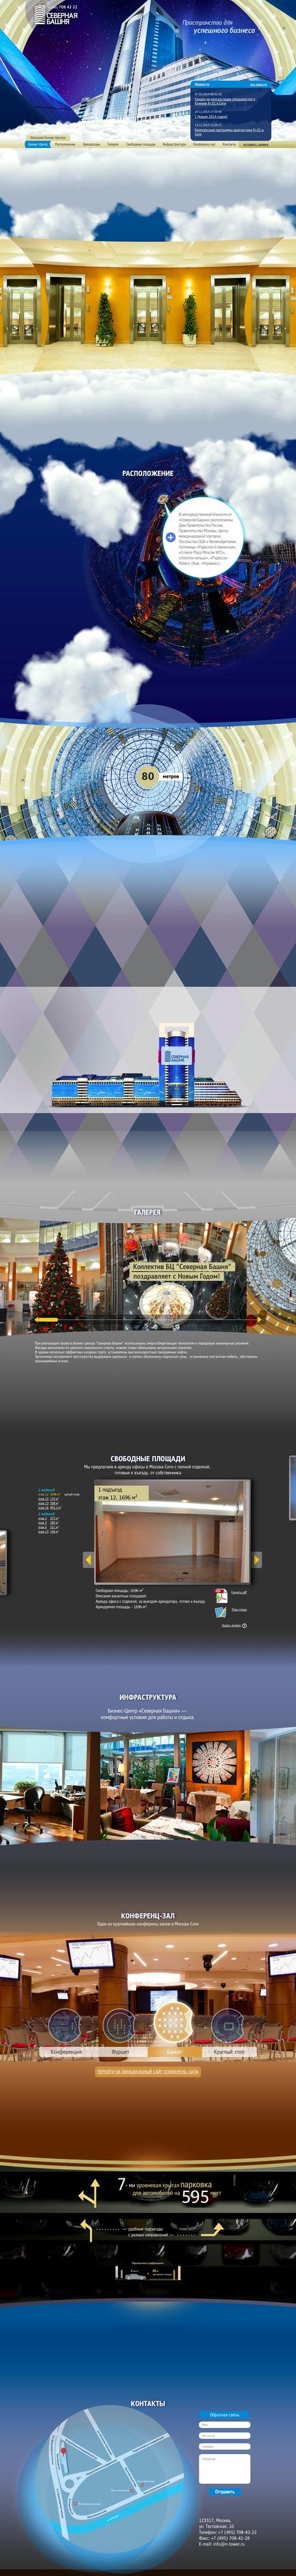 Сайт бизнес центра Северная Башня